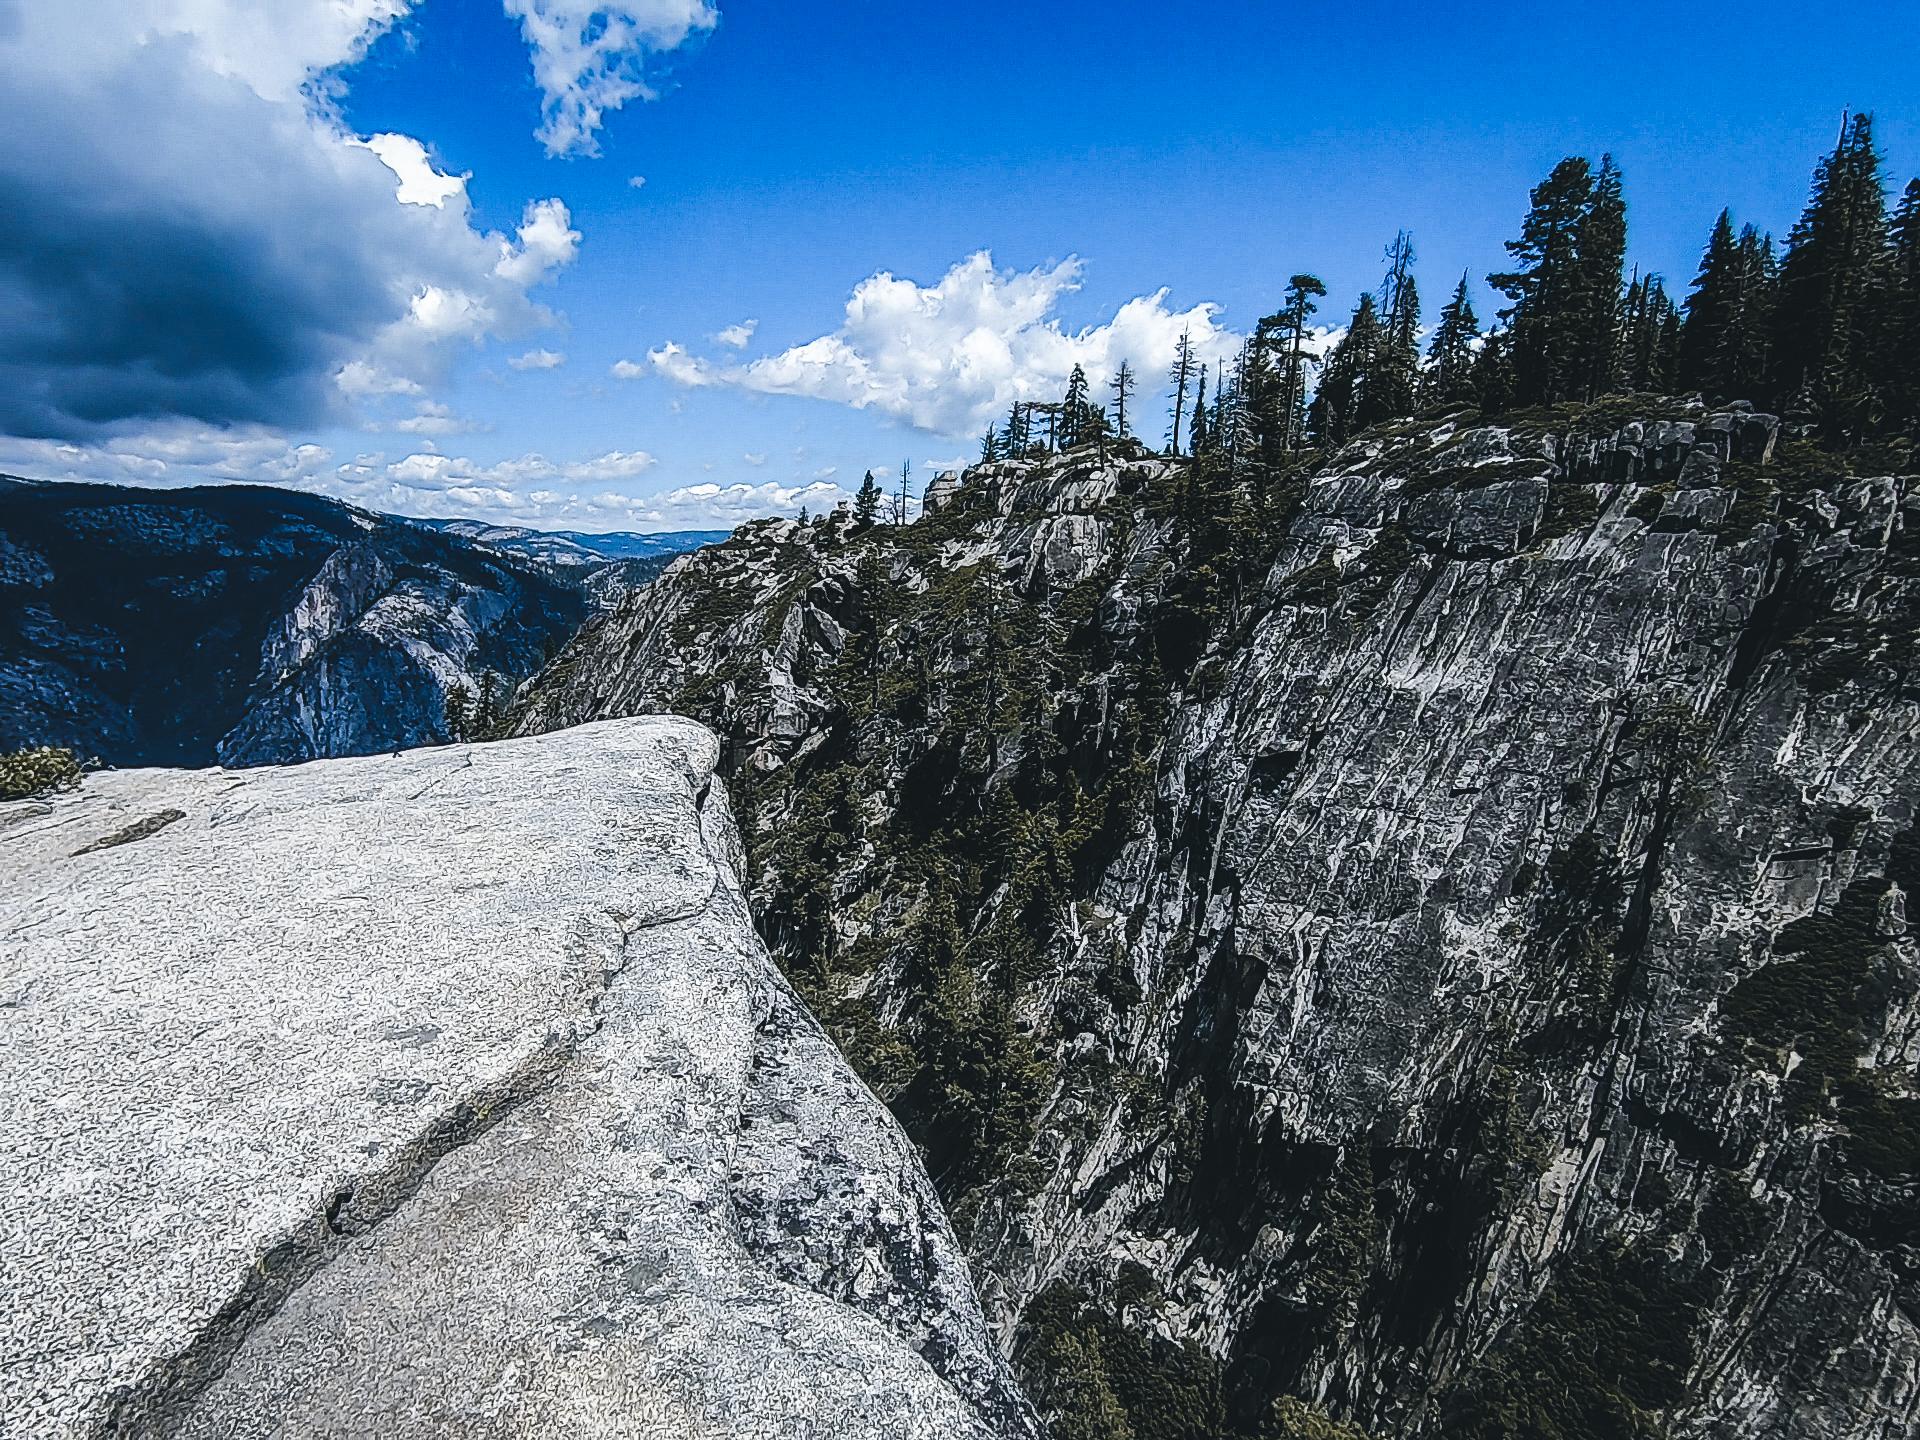 Taft Point Yosemite - Herschl.jpg